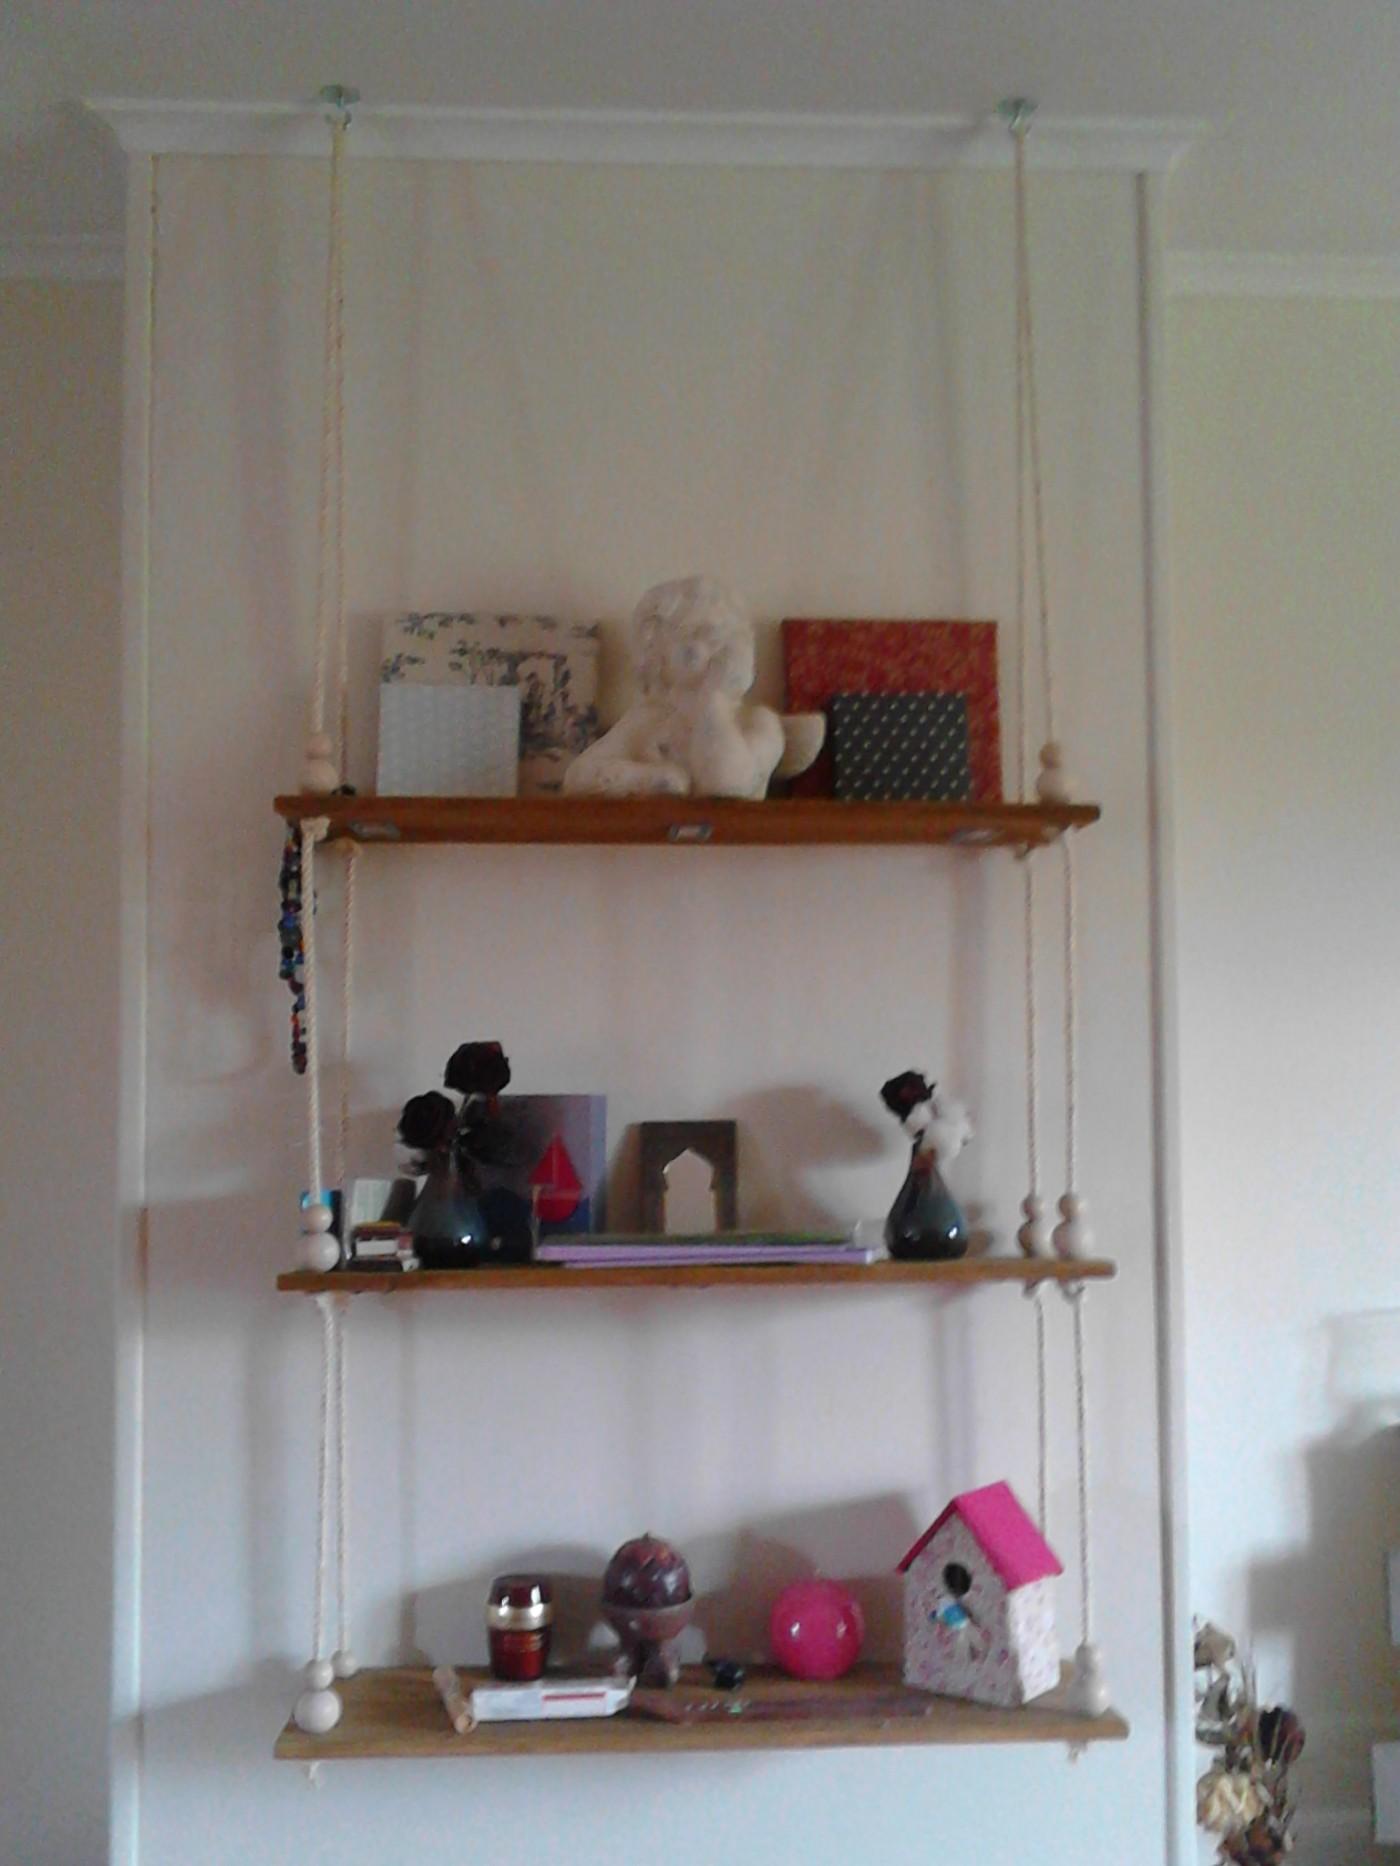 etag re suspendue blog z dio. Black Bedroom Furniture Sets. Home Design Ideas